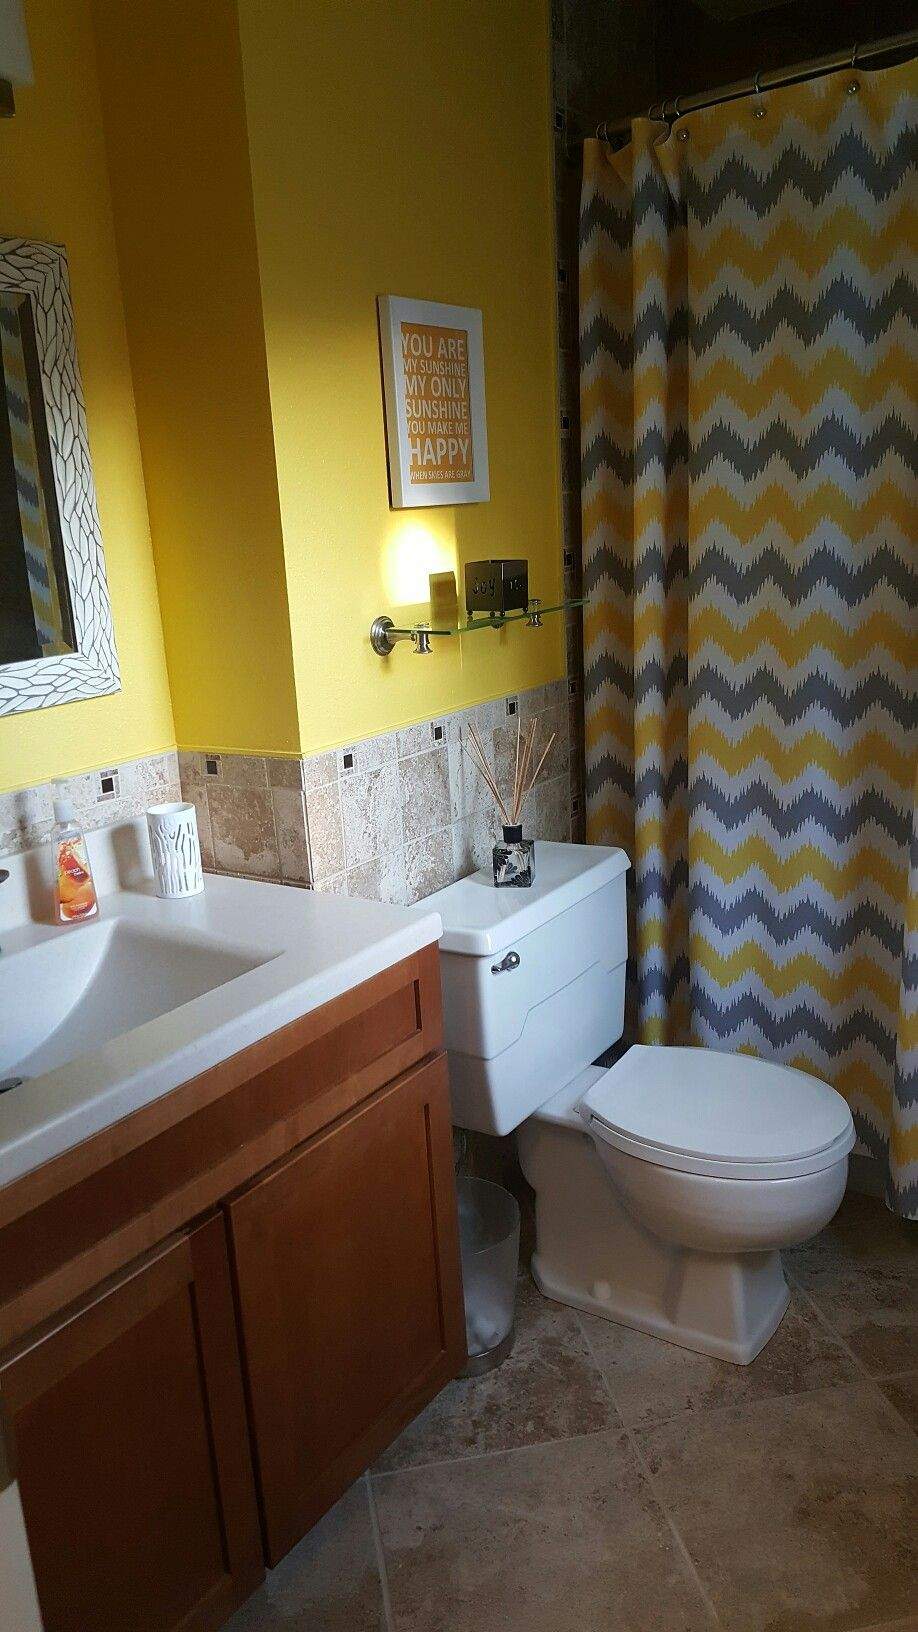 Making nautical bathroom d 233 cor by yourself bathroom designs ideas - Yellow And Gray Bathroom